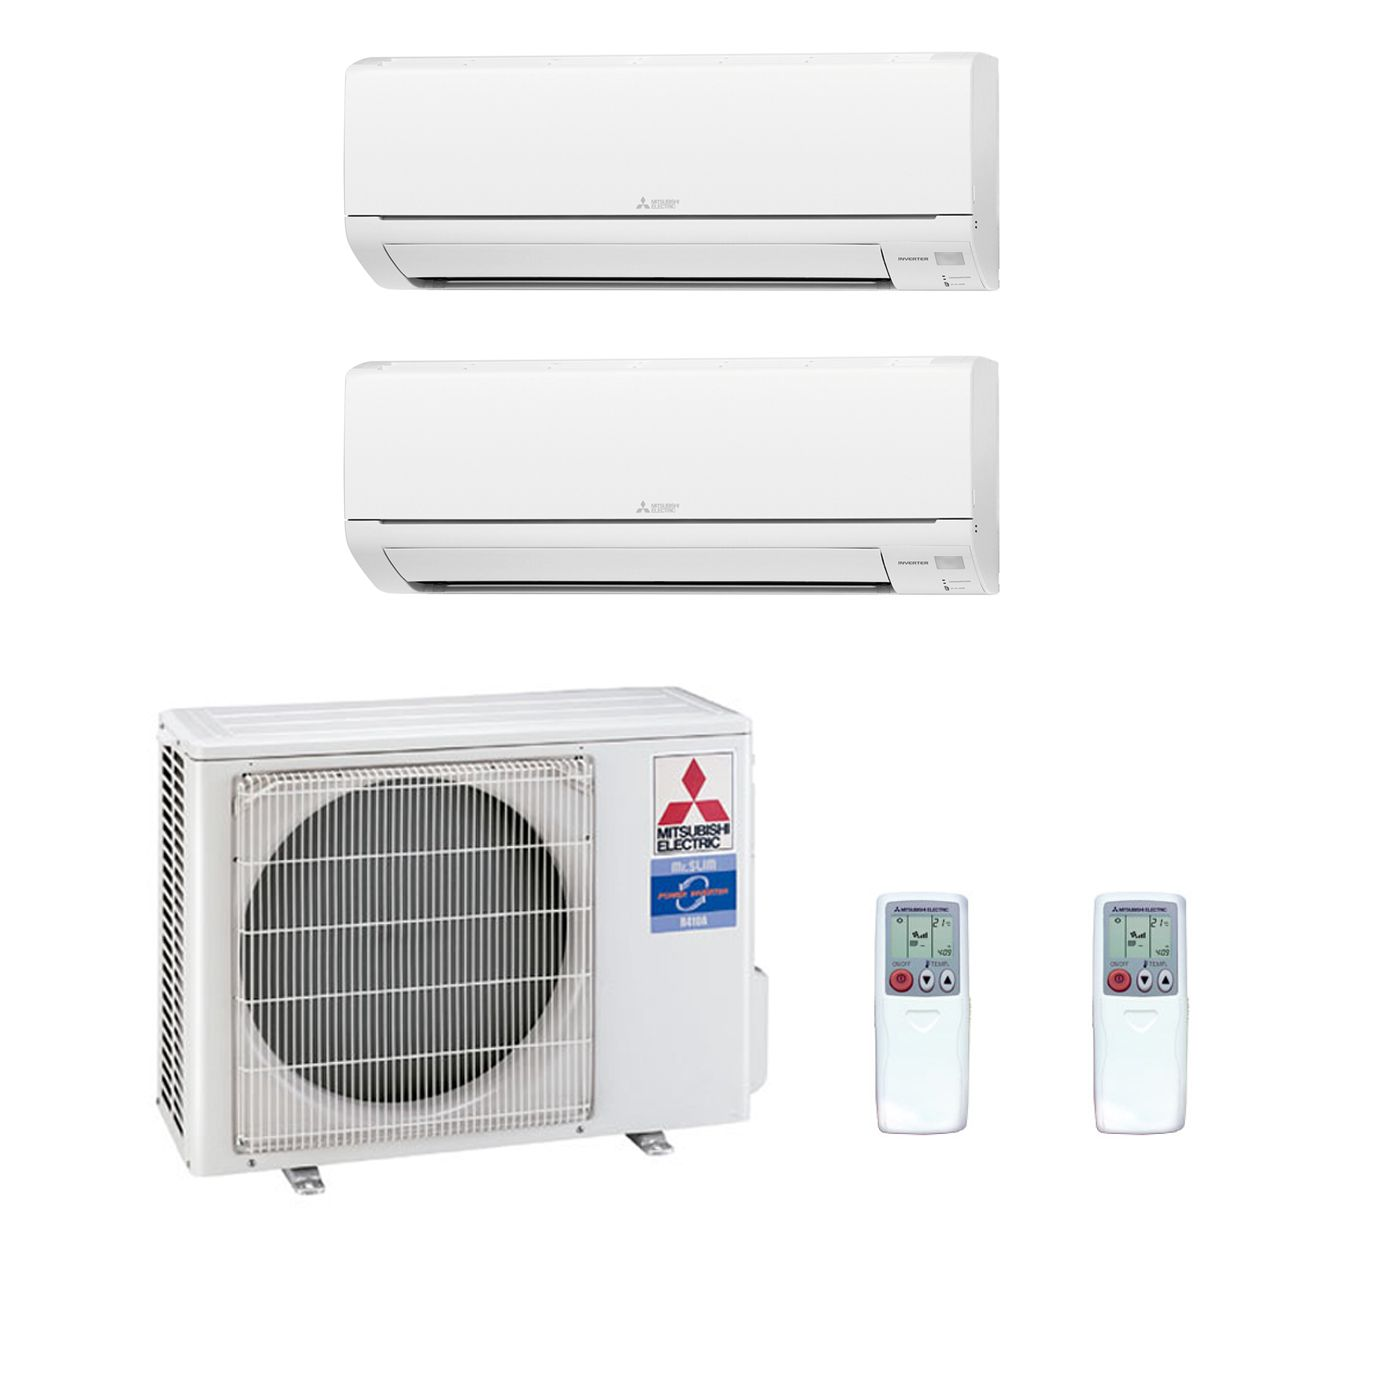 ton condenser mxz btu hyper zone ac conditioners air multi ductless msz heat mitsubishi